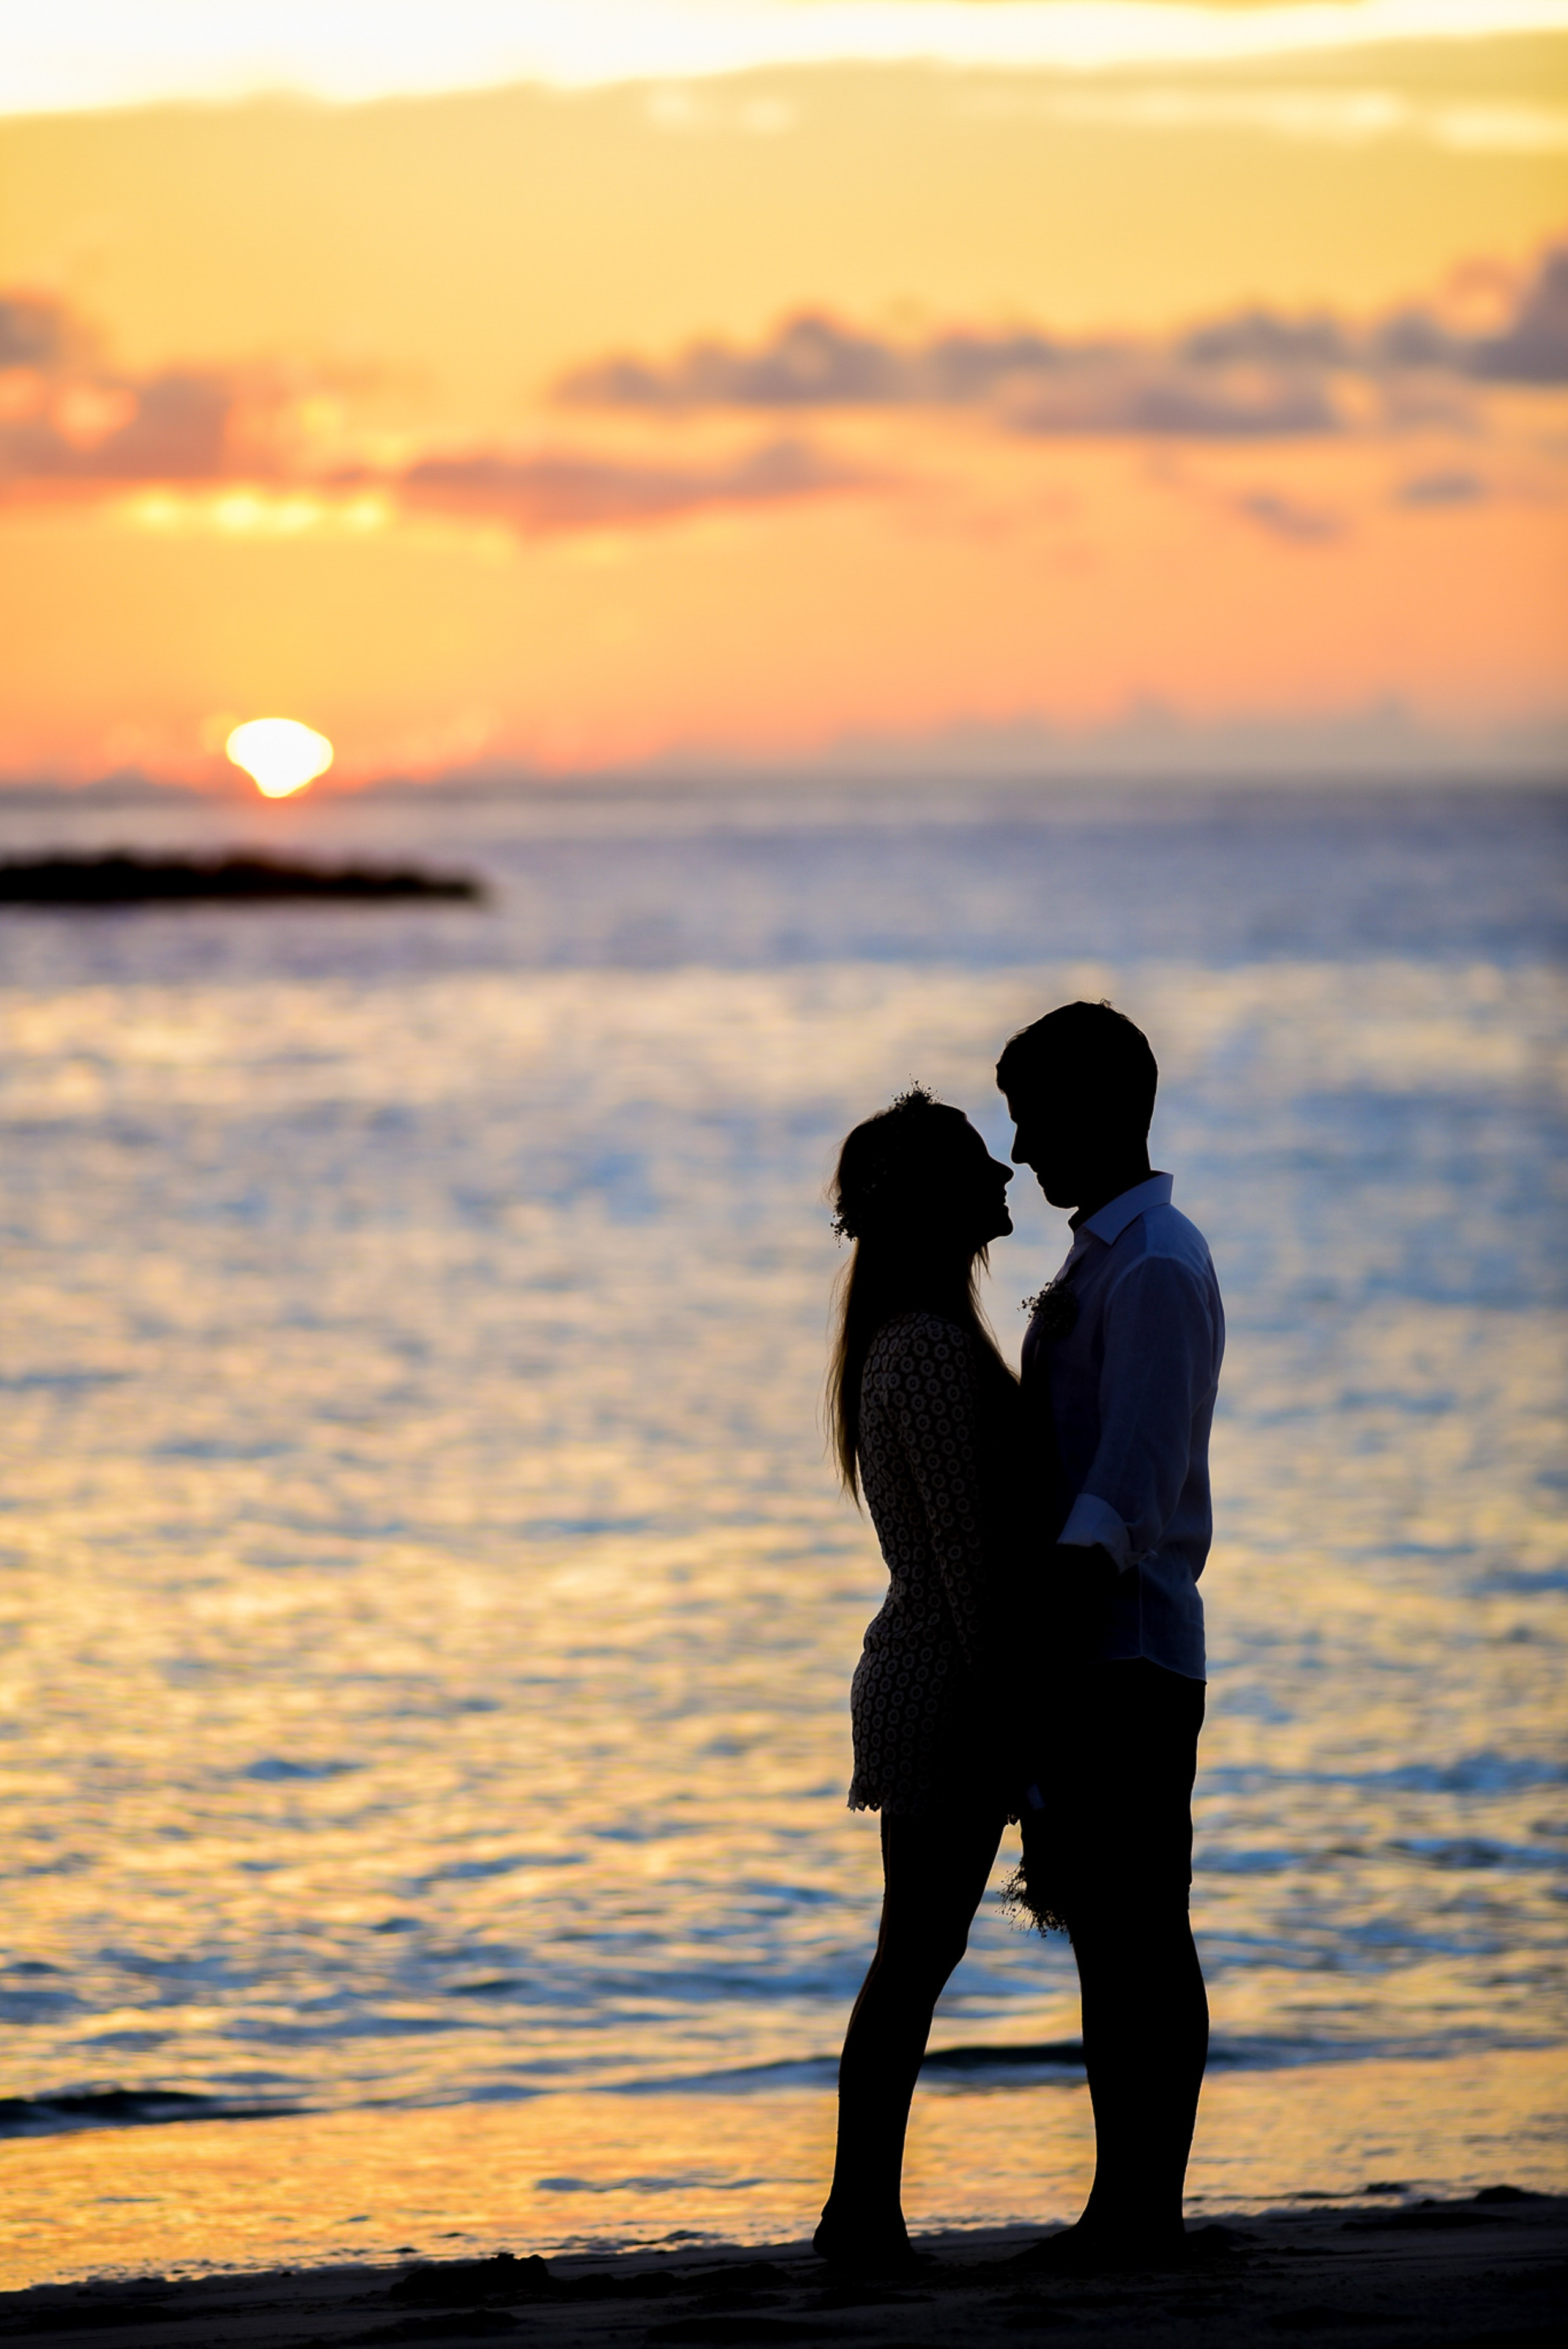 Silhouette of Couple on Seashore · Free Stock Photo